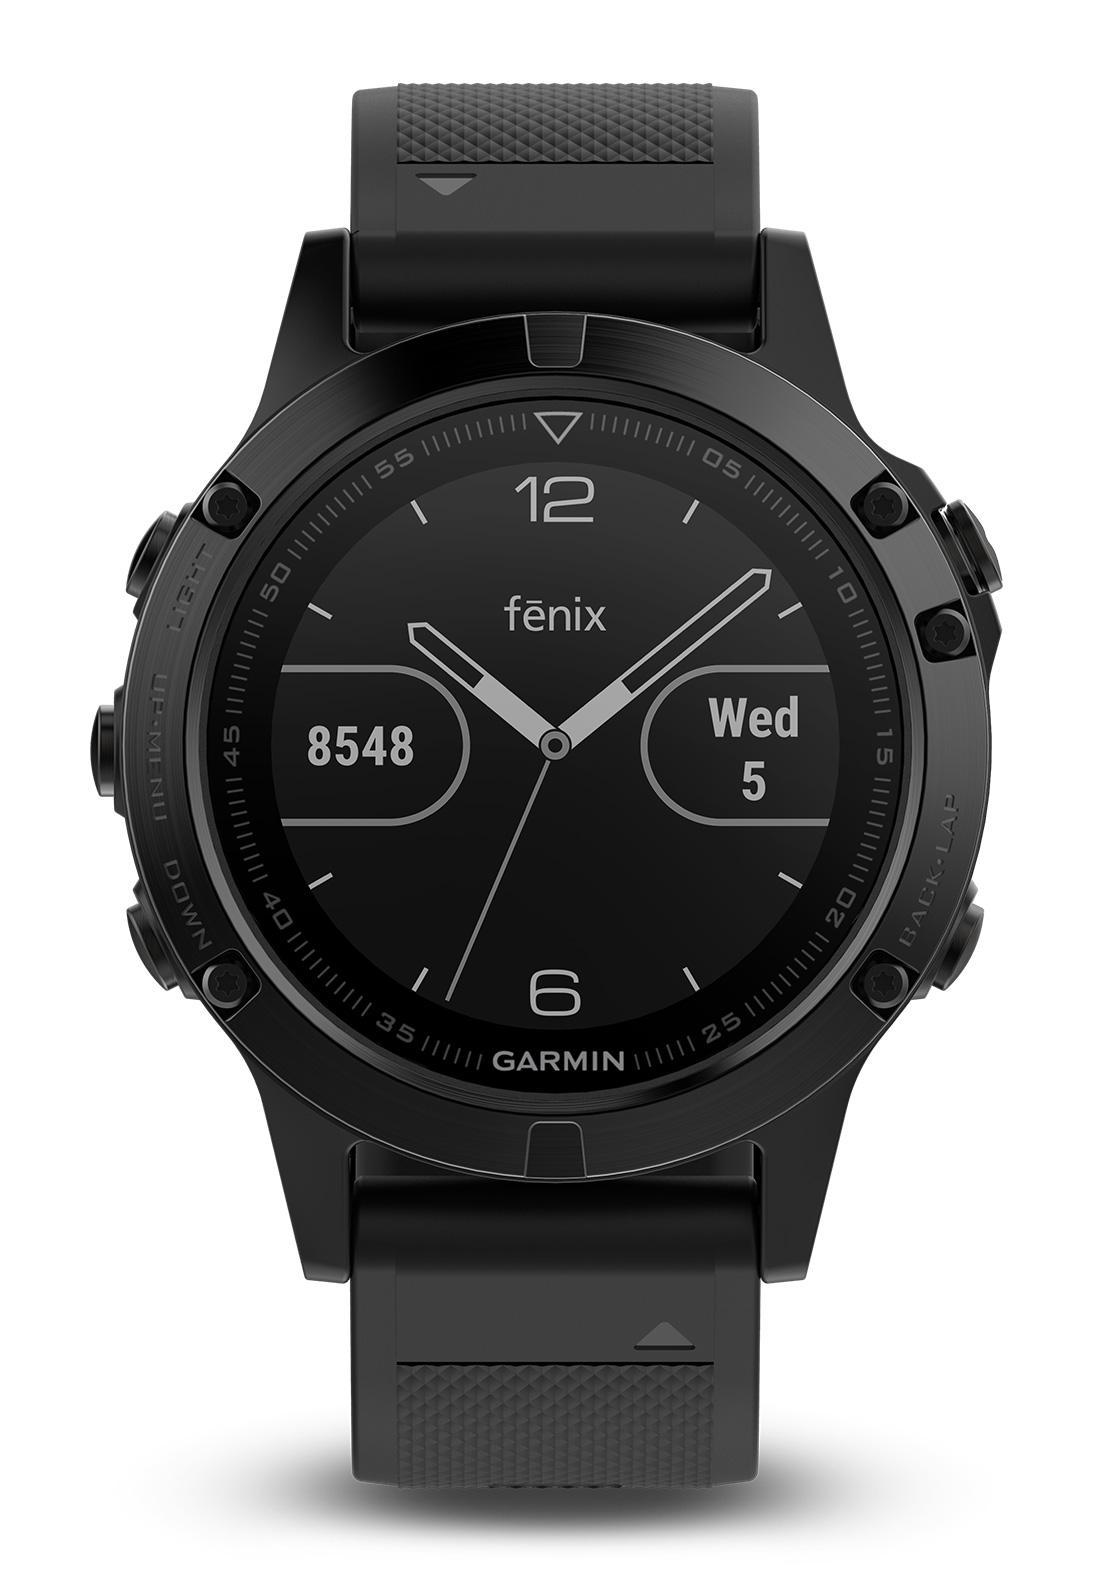 garmin fenix 5 saphir schwarz gps multisport smartwatch. Black Bedroom Furniture Sets. Home Design Ideas